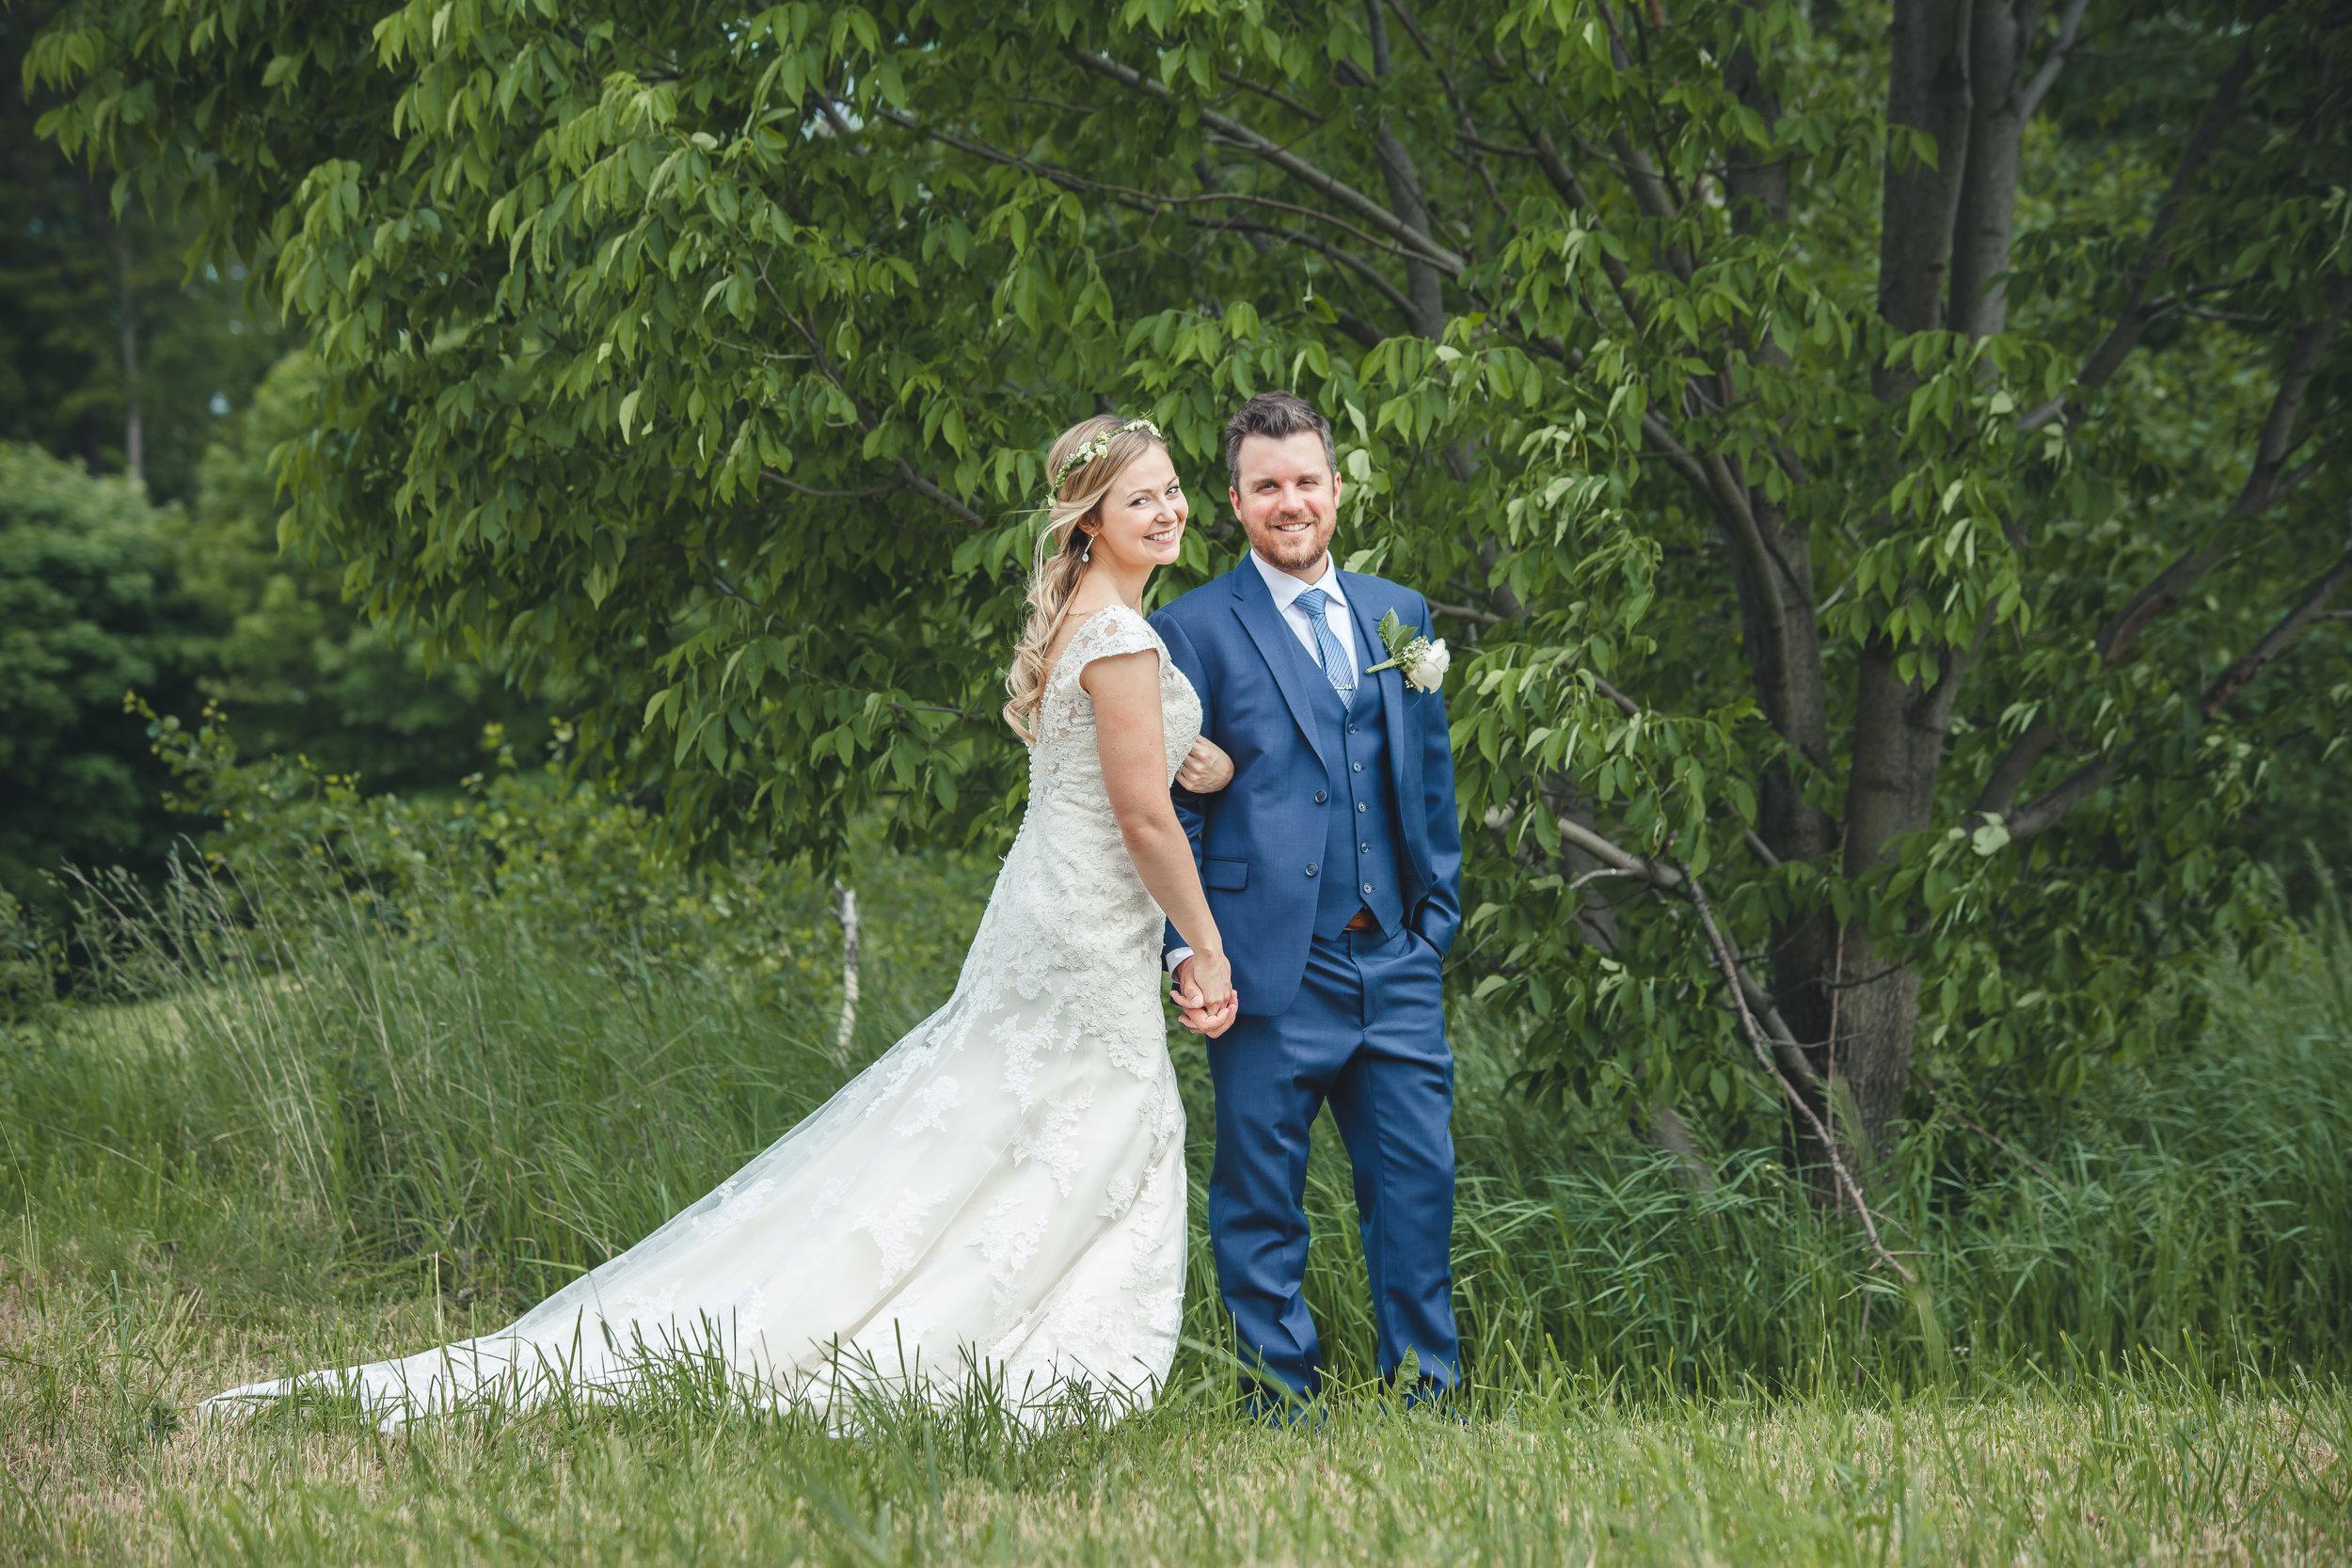 Amy D Photography Barrie and Muskoka Wedding Photography Barrie Country Club_-33.jpg